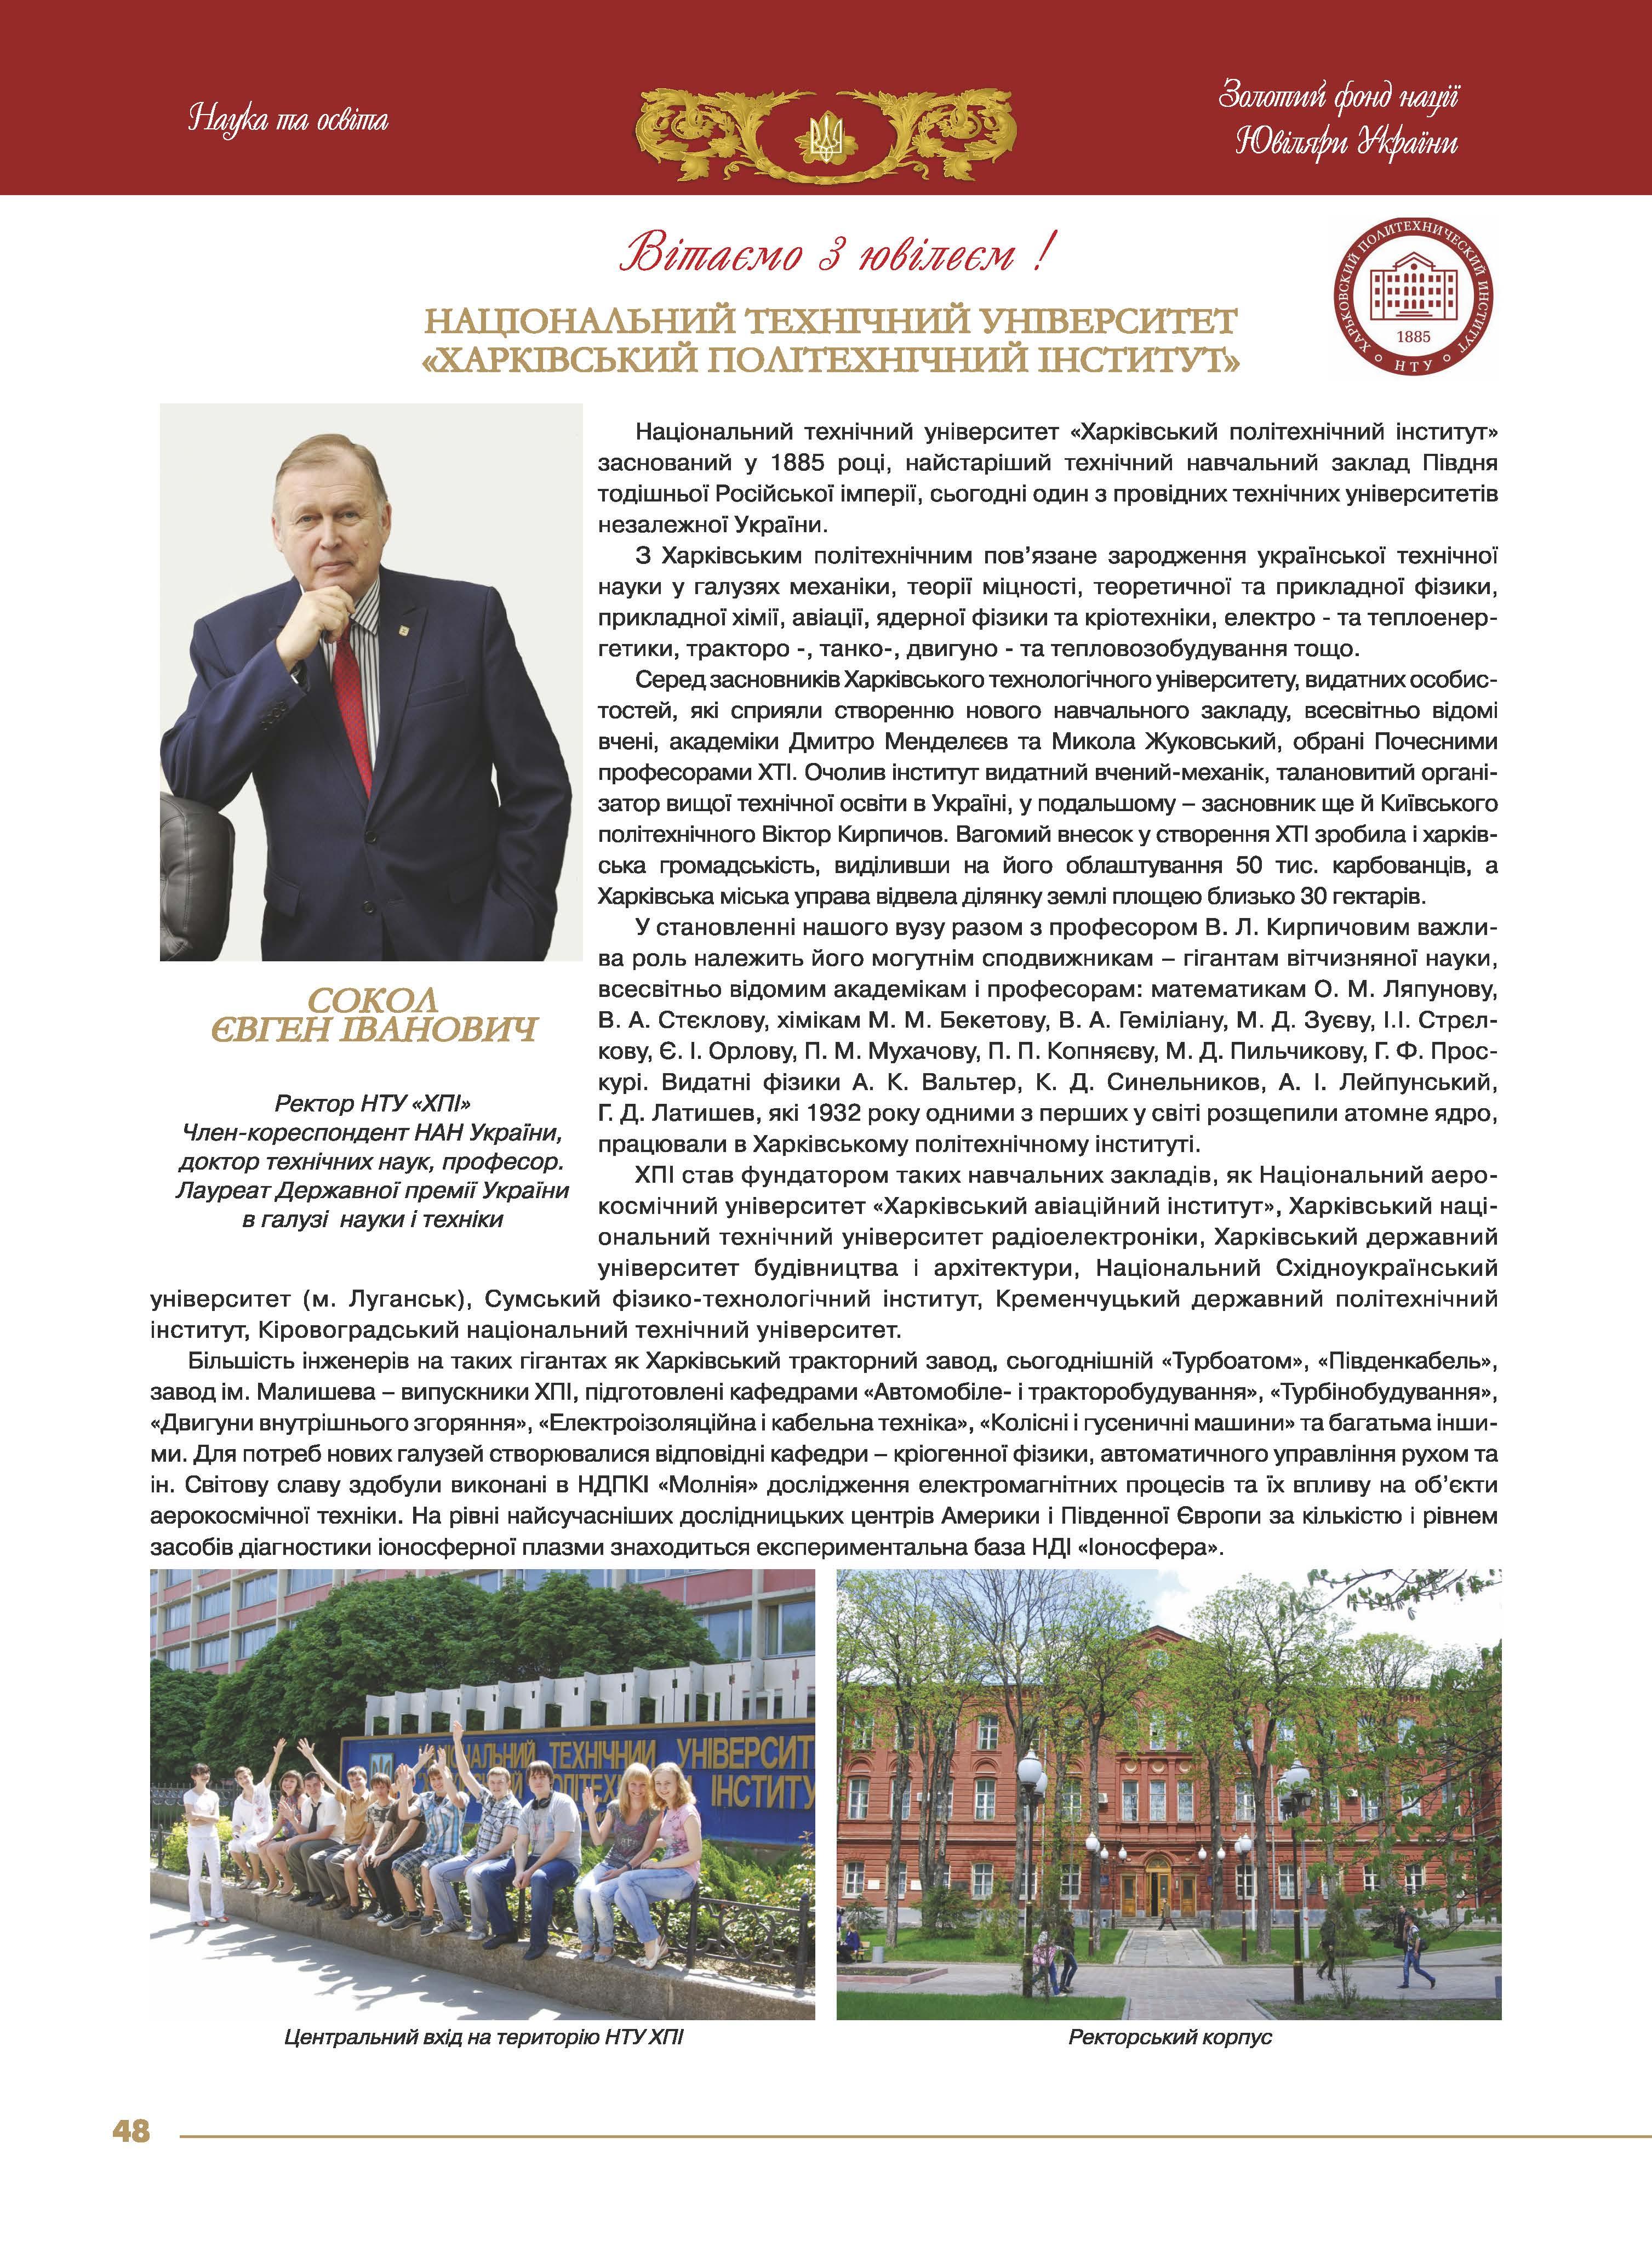 Сокол Євген Іванович